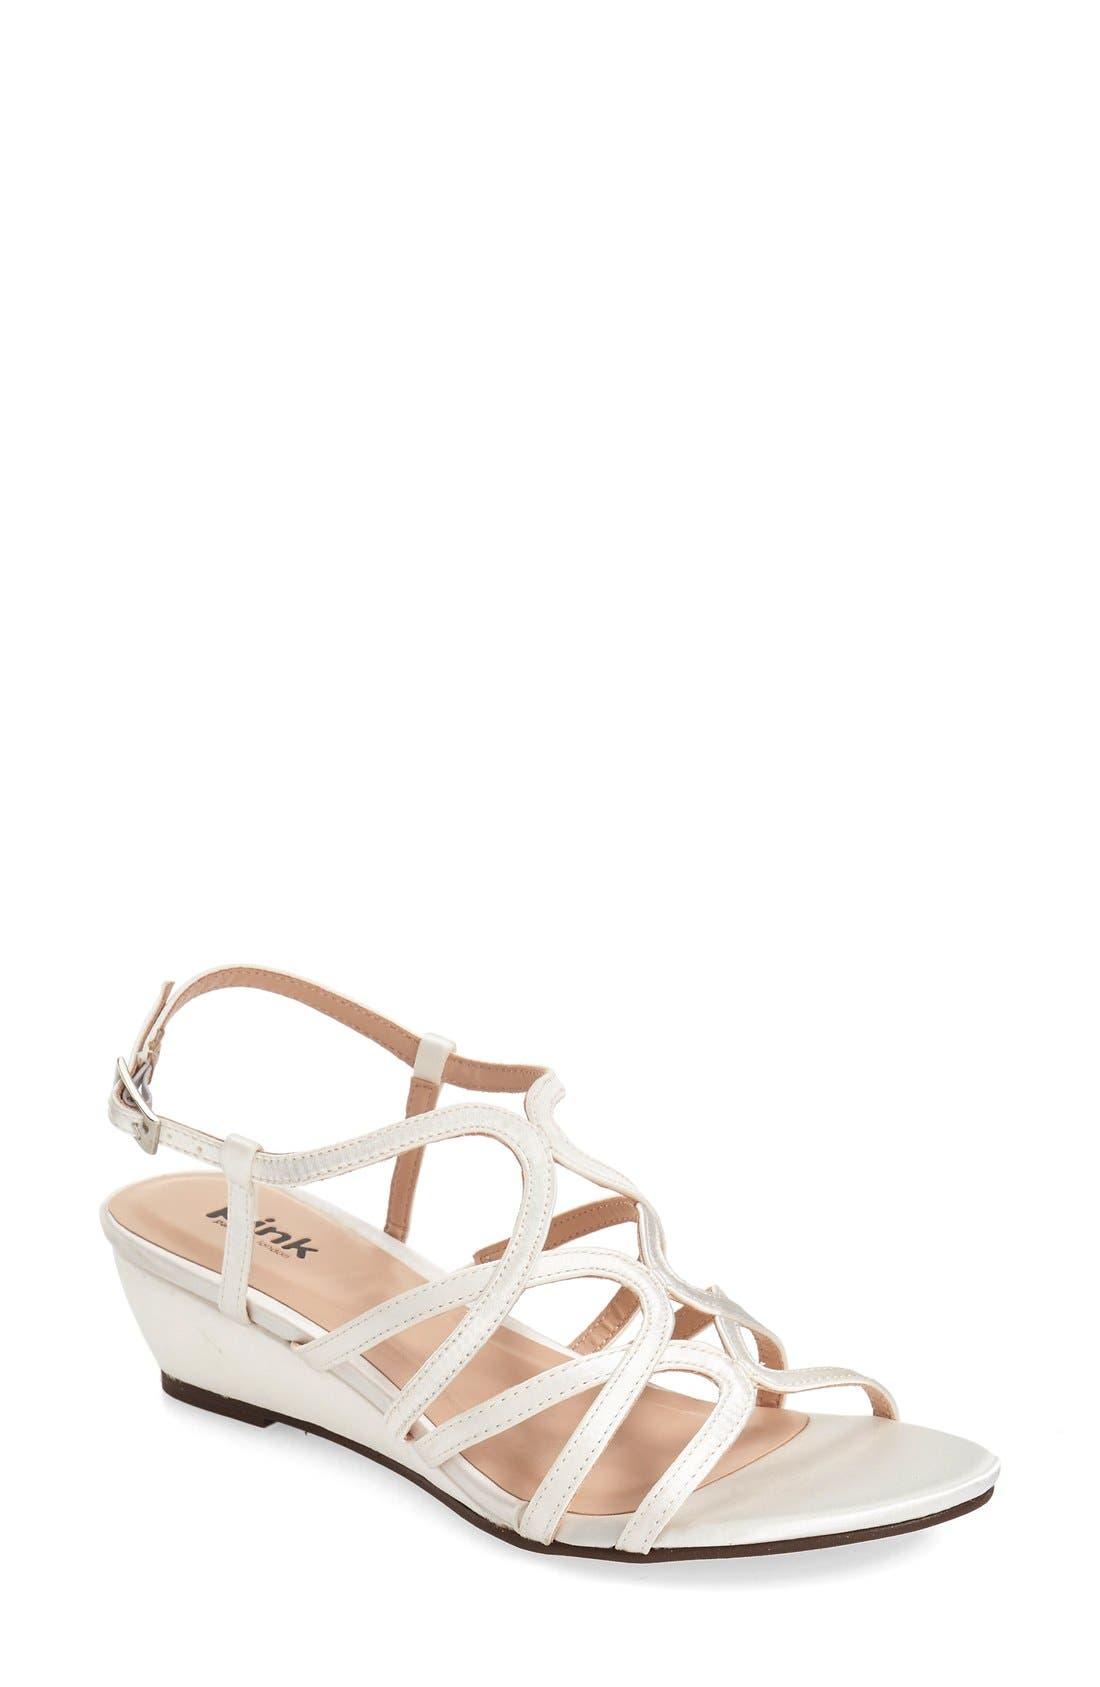 Alternate Image 1 Selected - pink paradox london 'Opulent' Wedge Sandal (Women)